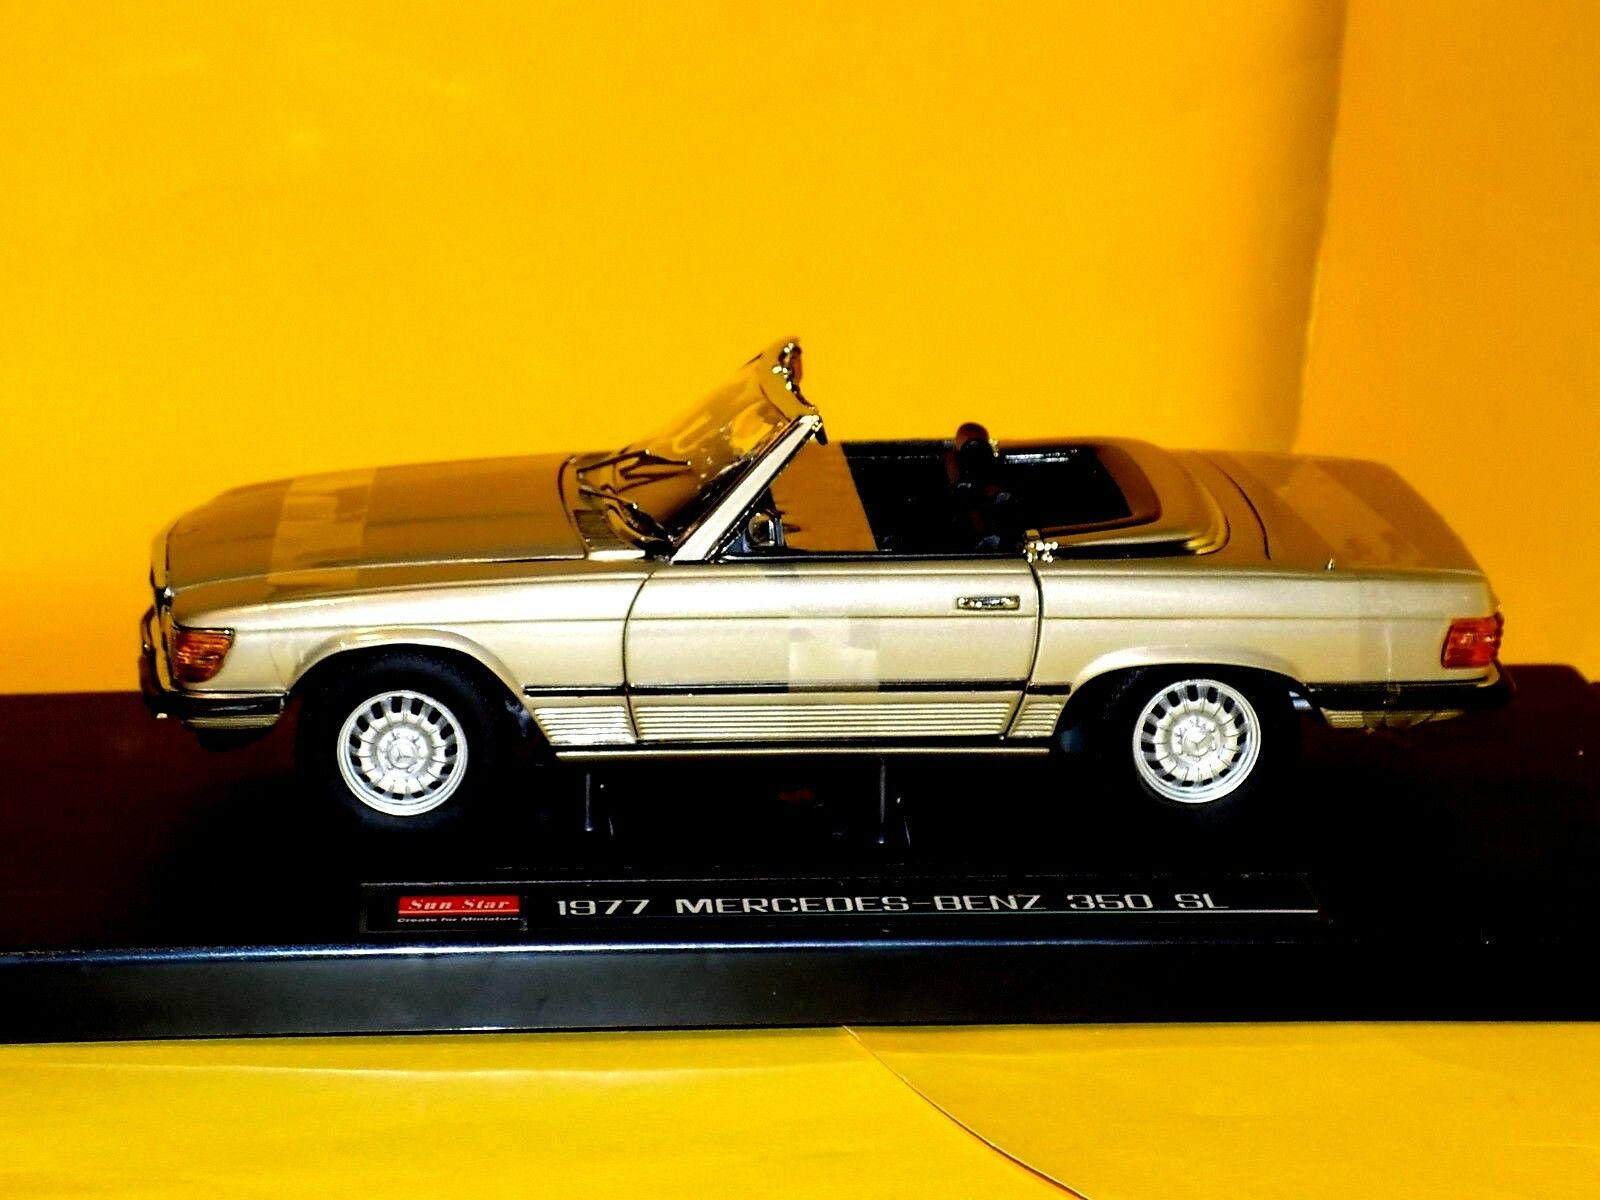 Mercedes Benz  MB 350 SL  OPEN CONgreenIBLE  gold 1977  SUN STAR 4595 1 18